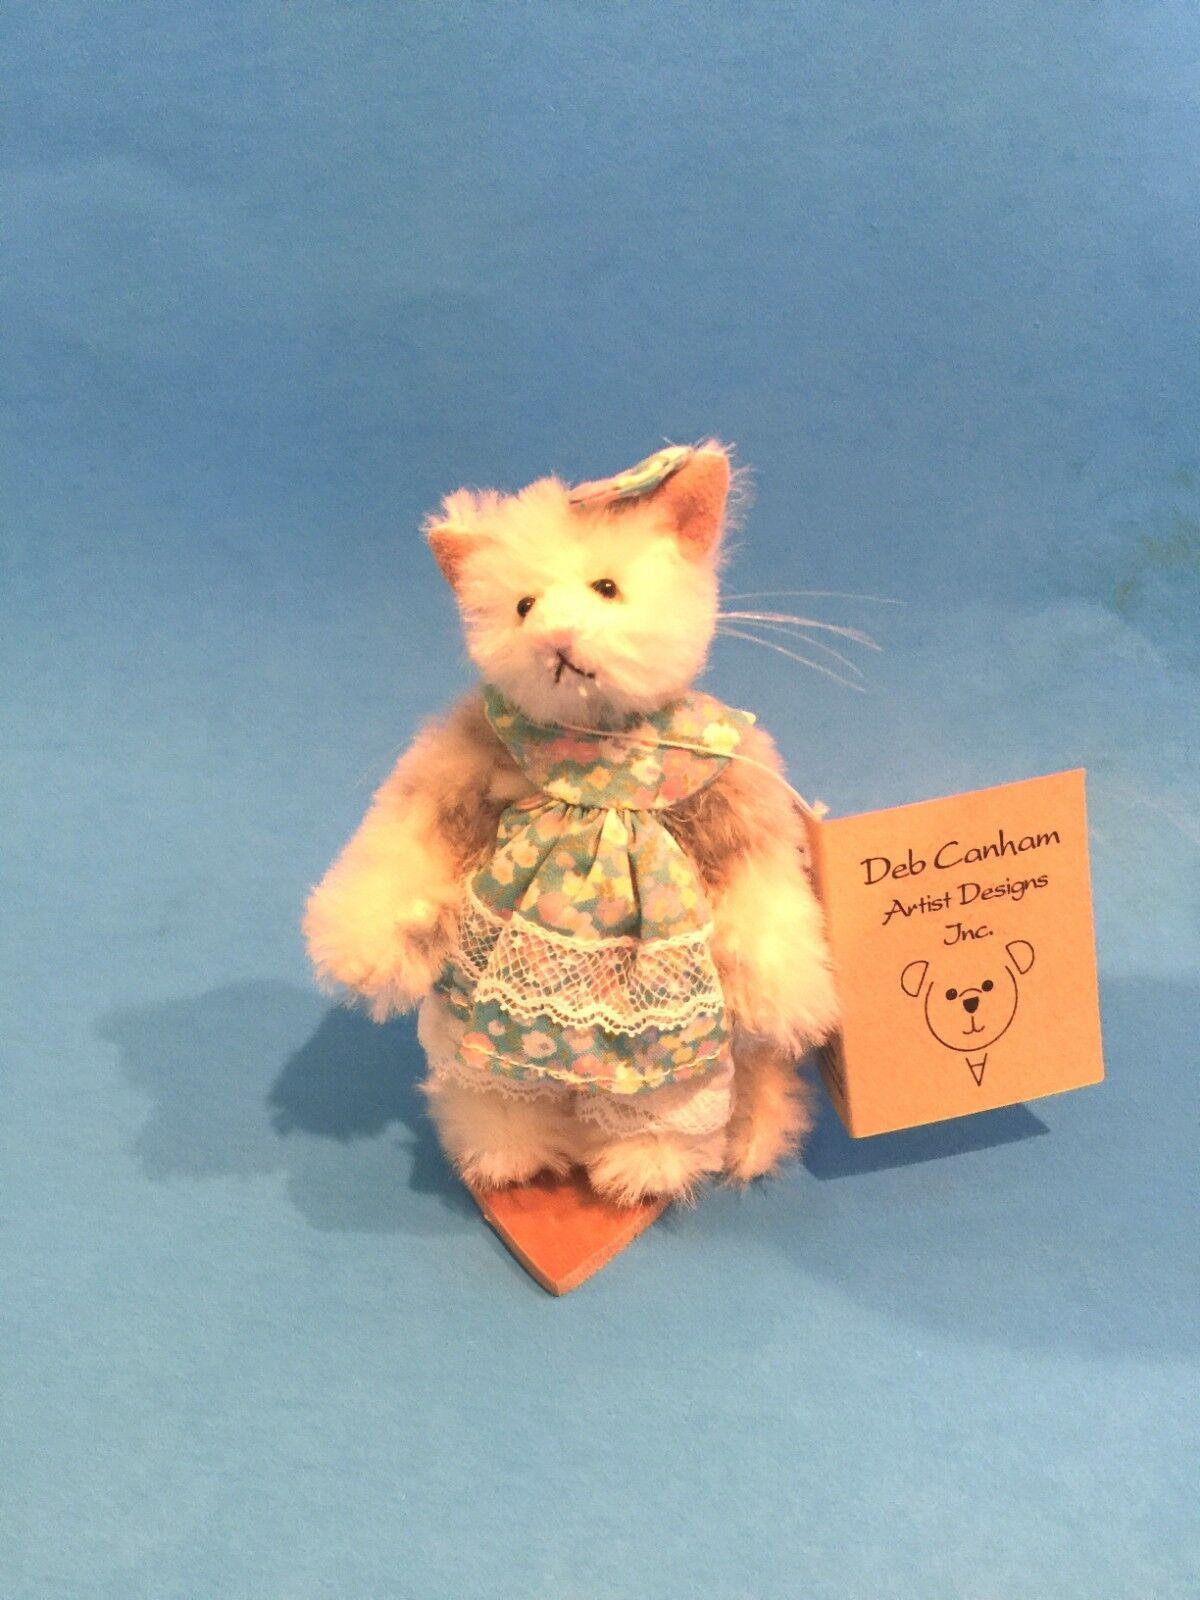 DEB CANHAM  PRUE  MINIATURE Weiß MOHAIR CAT WITH FLORAL DRESS- 3